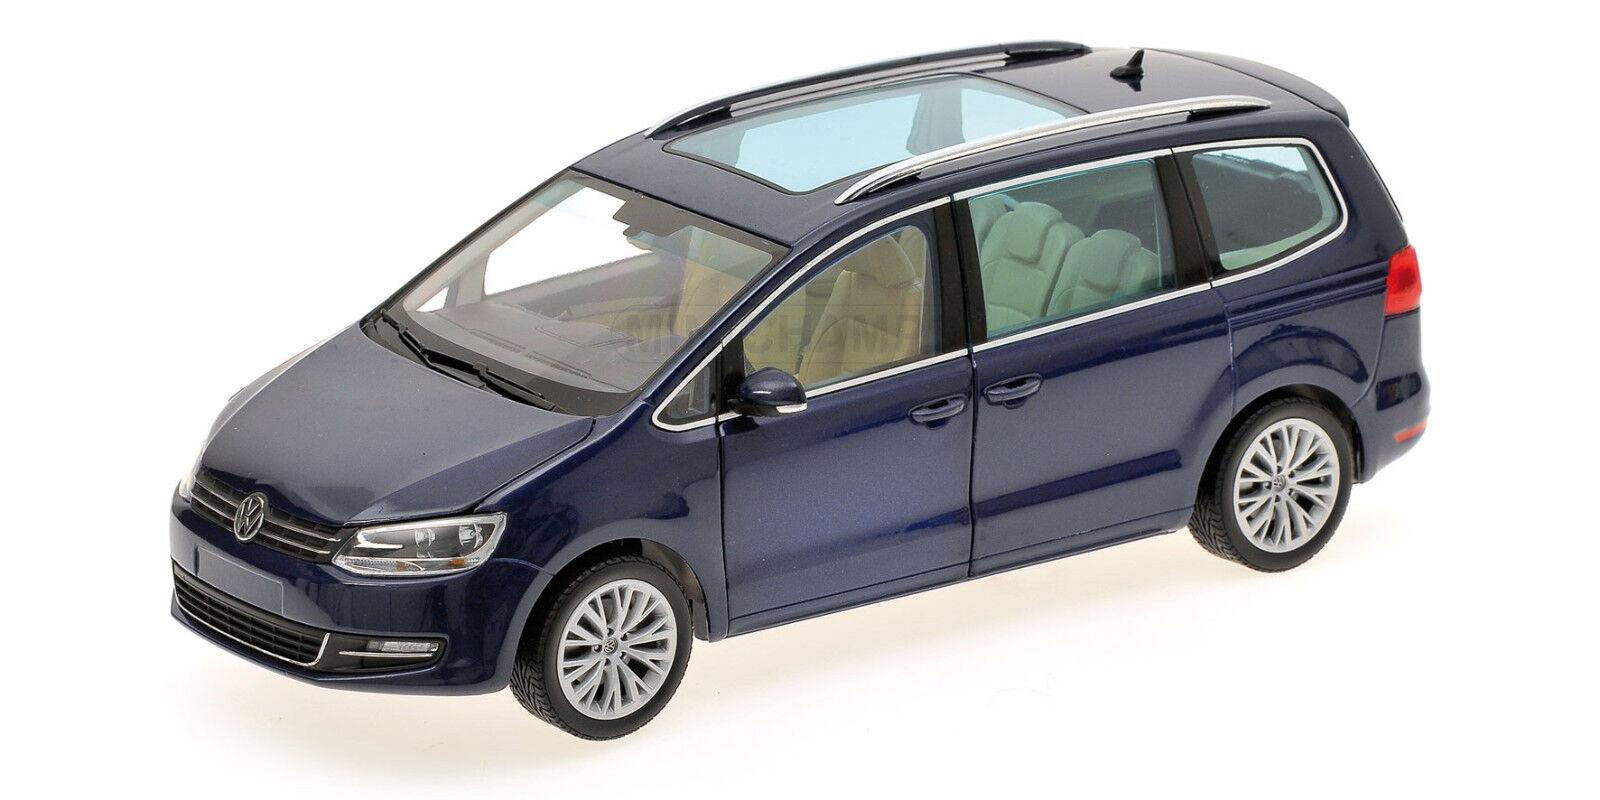 1 18 Volkswagen SHARAN 2010 bleu METAL l.E. 1002 MINICHAMPS 110051000 neuf dans sa boîte NEUF